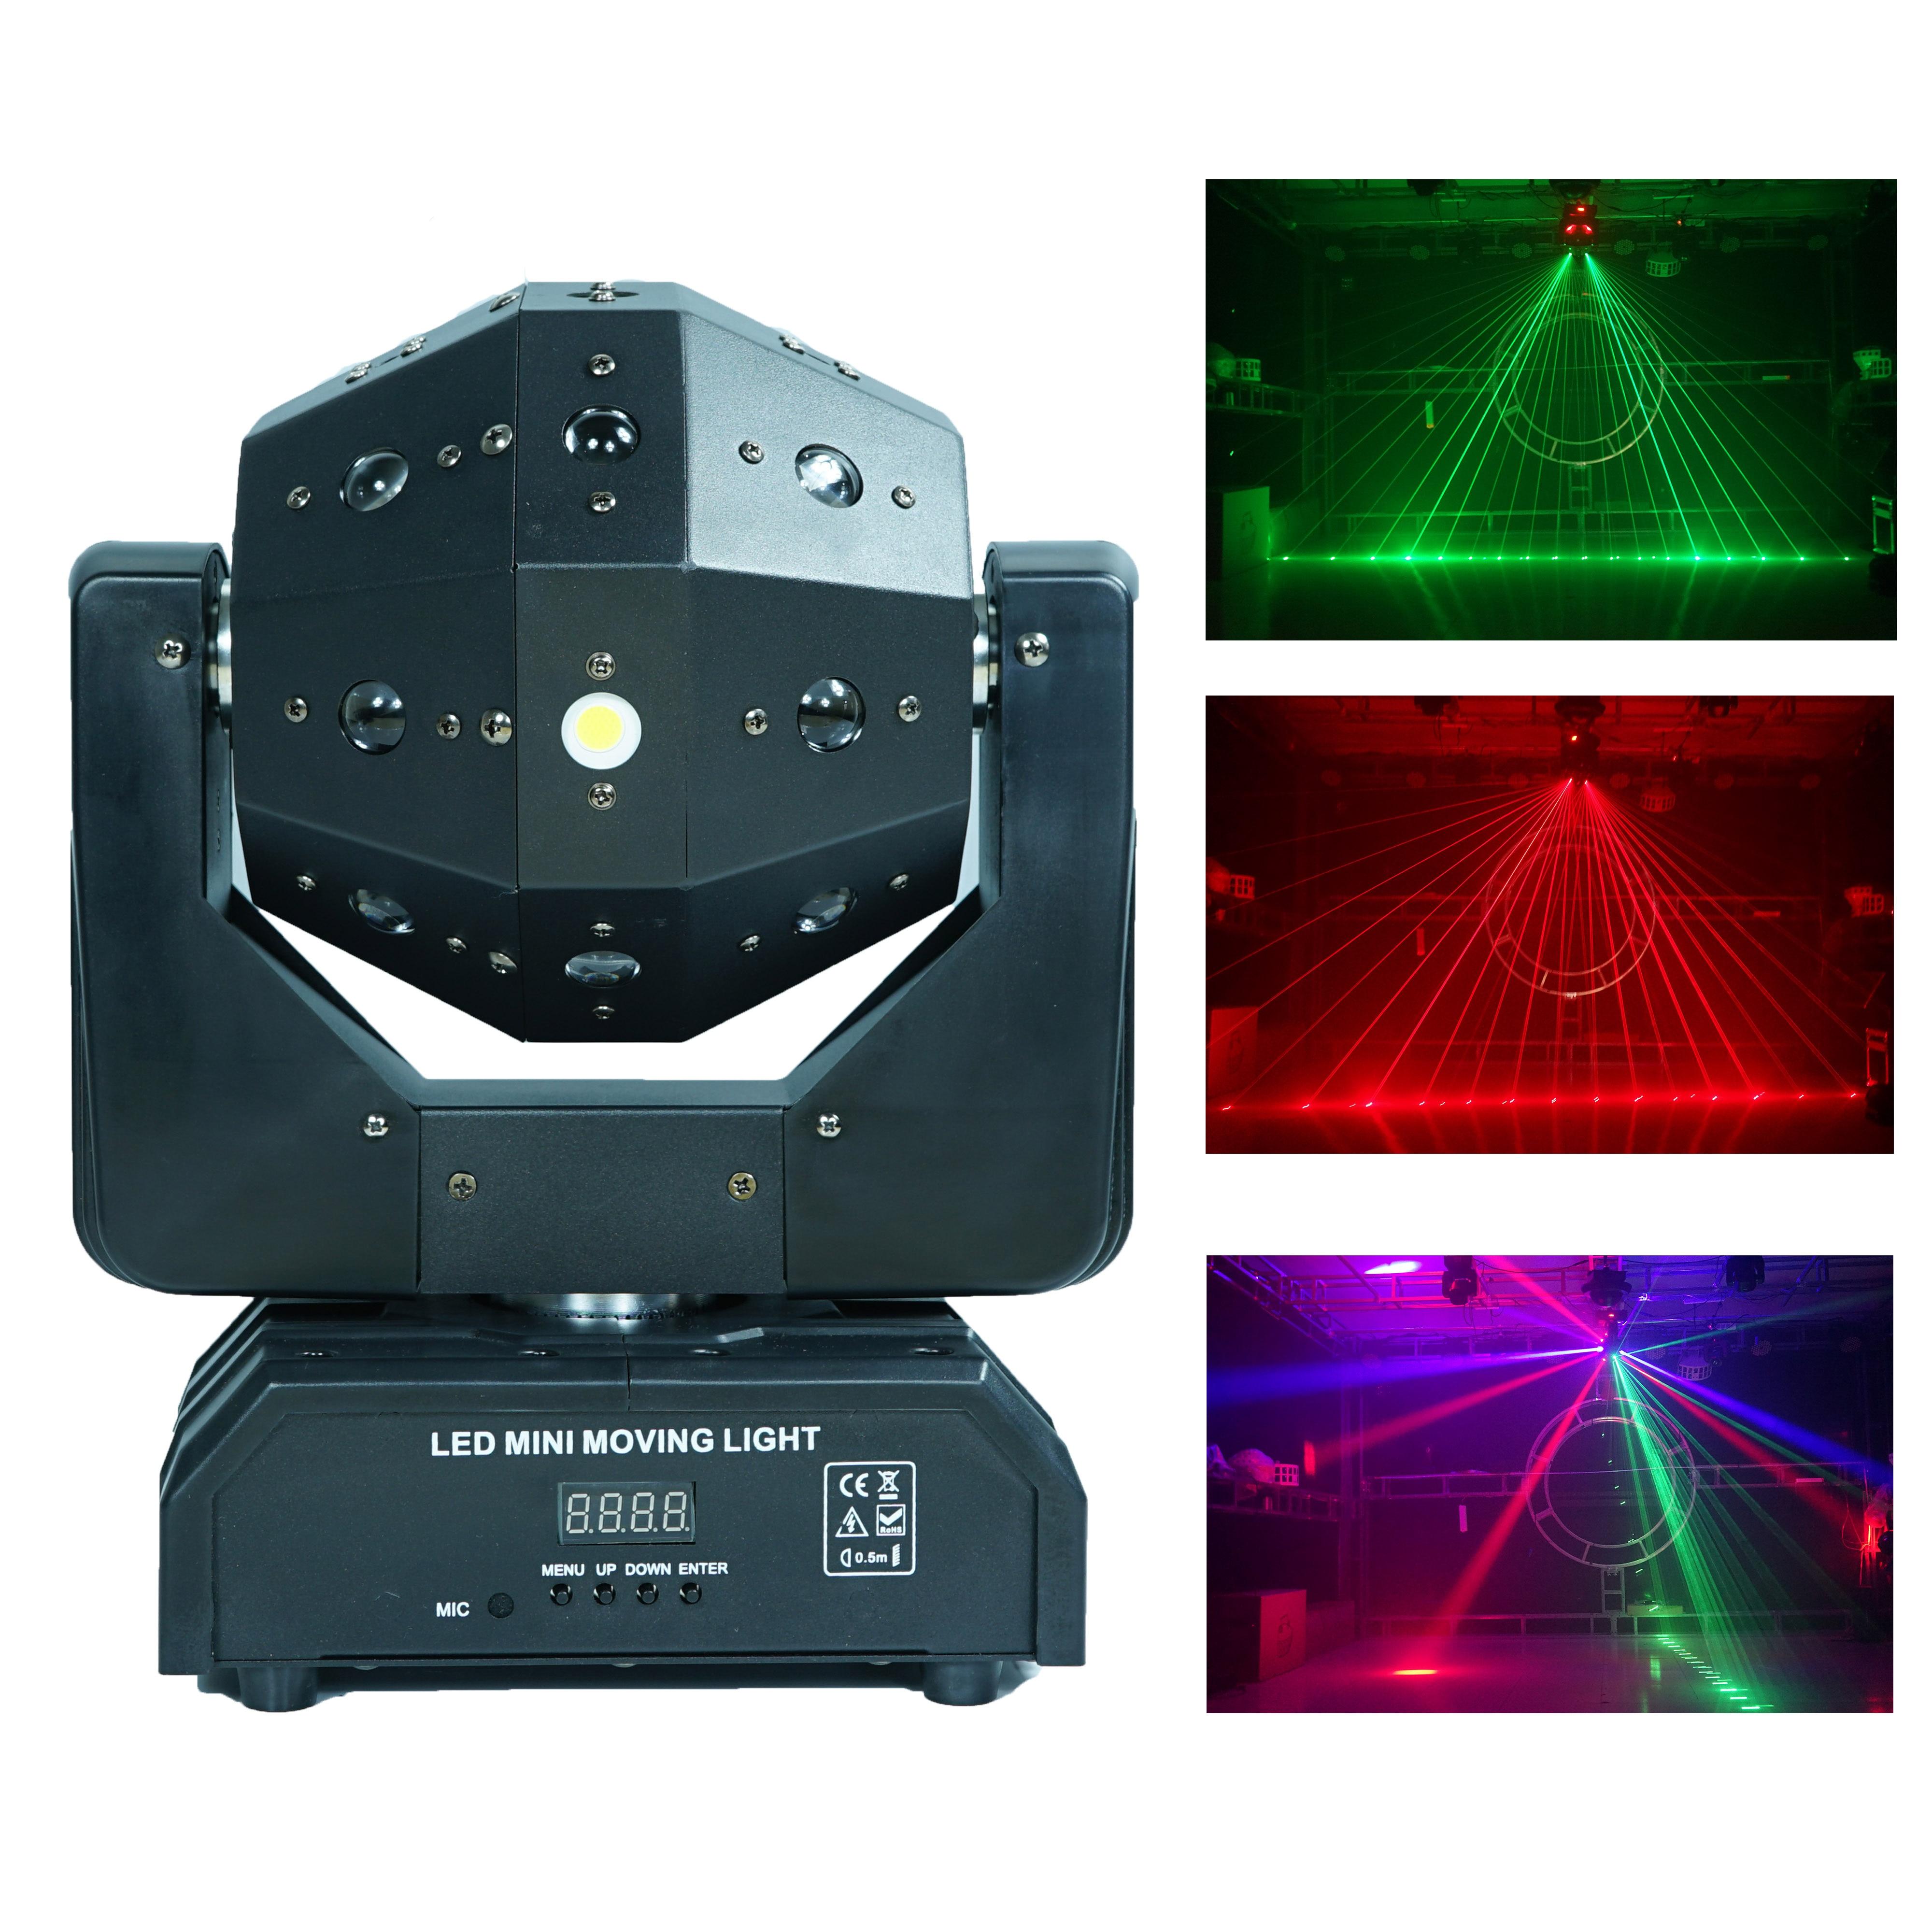 YaYao-كرة رأس متحركة صغيرة LED ، 3 في 1 ستروب ليزر ، رؤوس متحركة DMX دوارة بلا حدود ، LED ديسكو DJ Lig